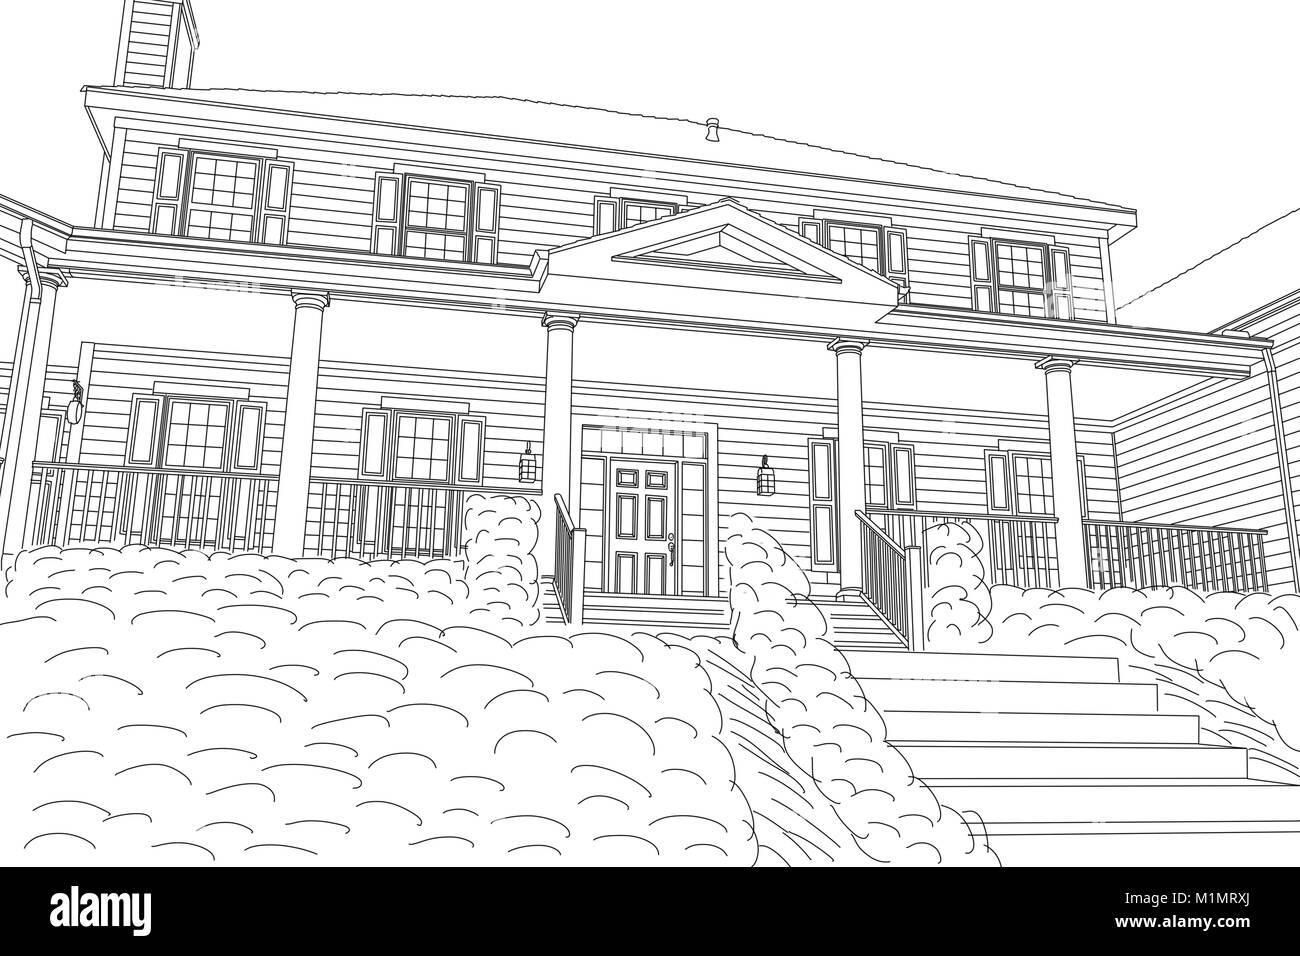 Beautiful Custom House Drawing On A White Background Stock Photo Alamy